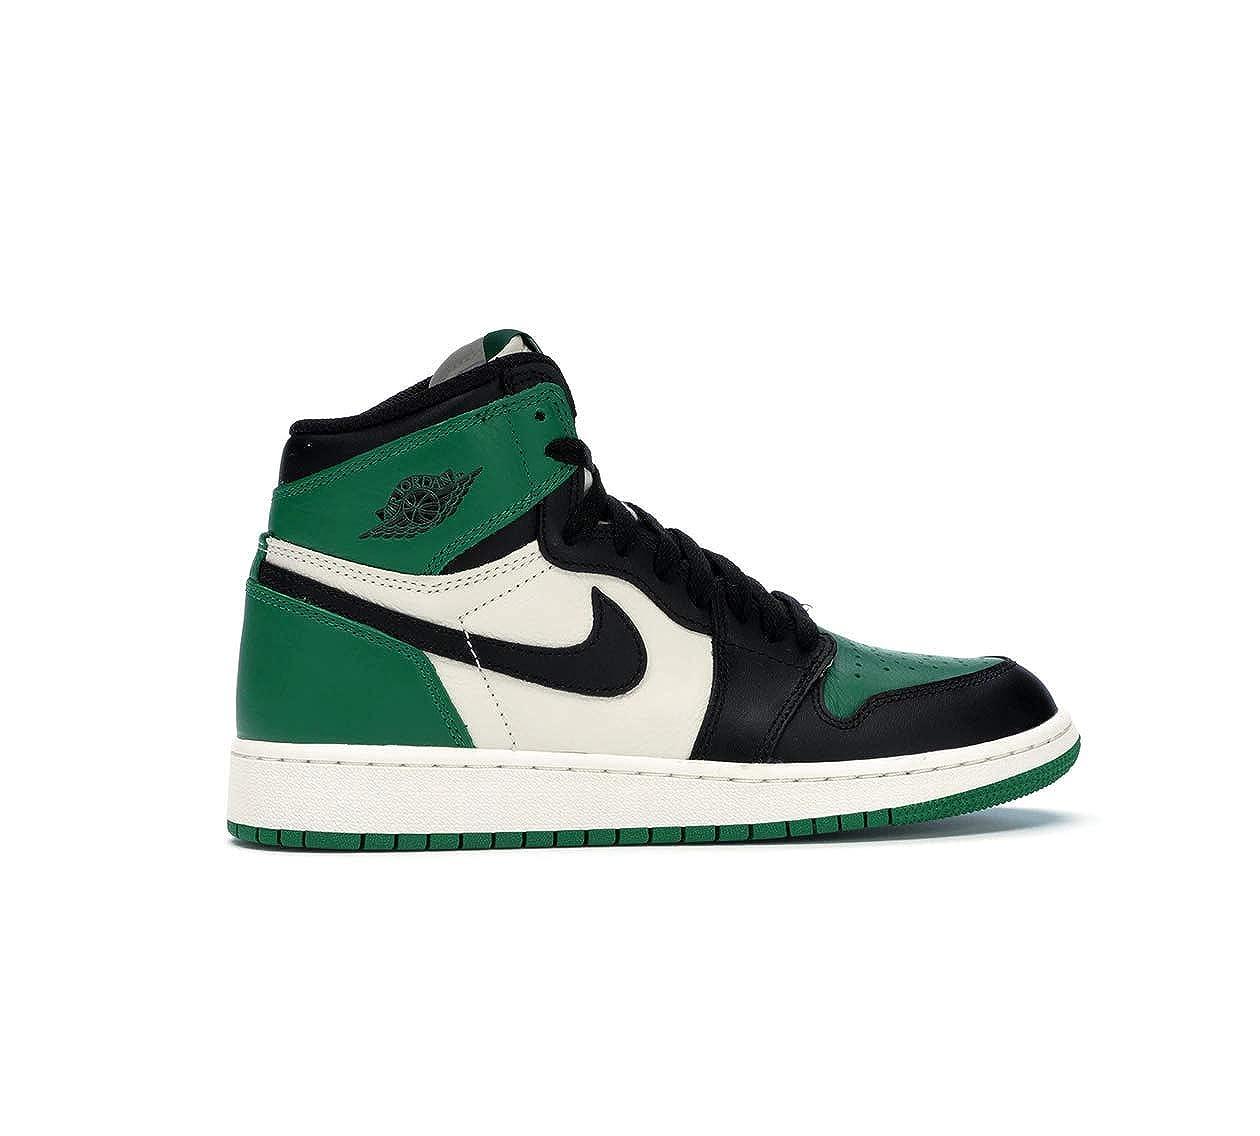 06f9ee2da191a7 Amazon.com  NIKE Air Jordan I 1 Pine Green GS BG 575441-302 SU Size 4.5Y   Shoes